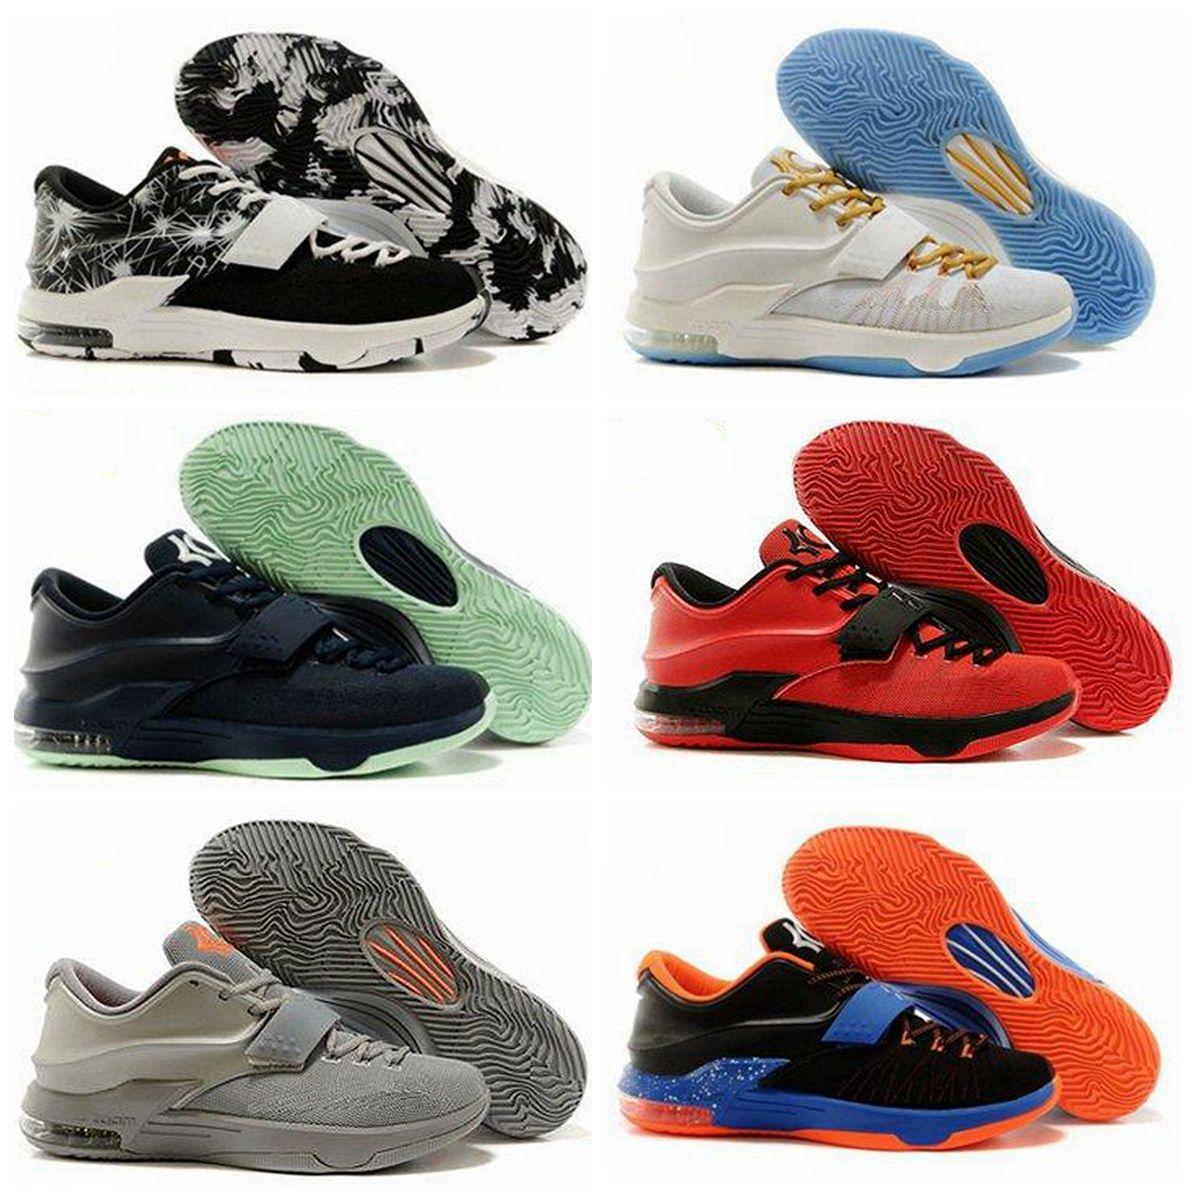 2016 new kevin durant kd 7 basketball shoe kd7 sports shoe